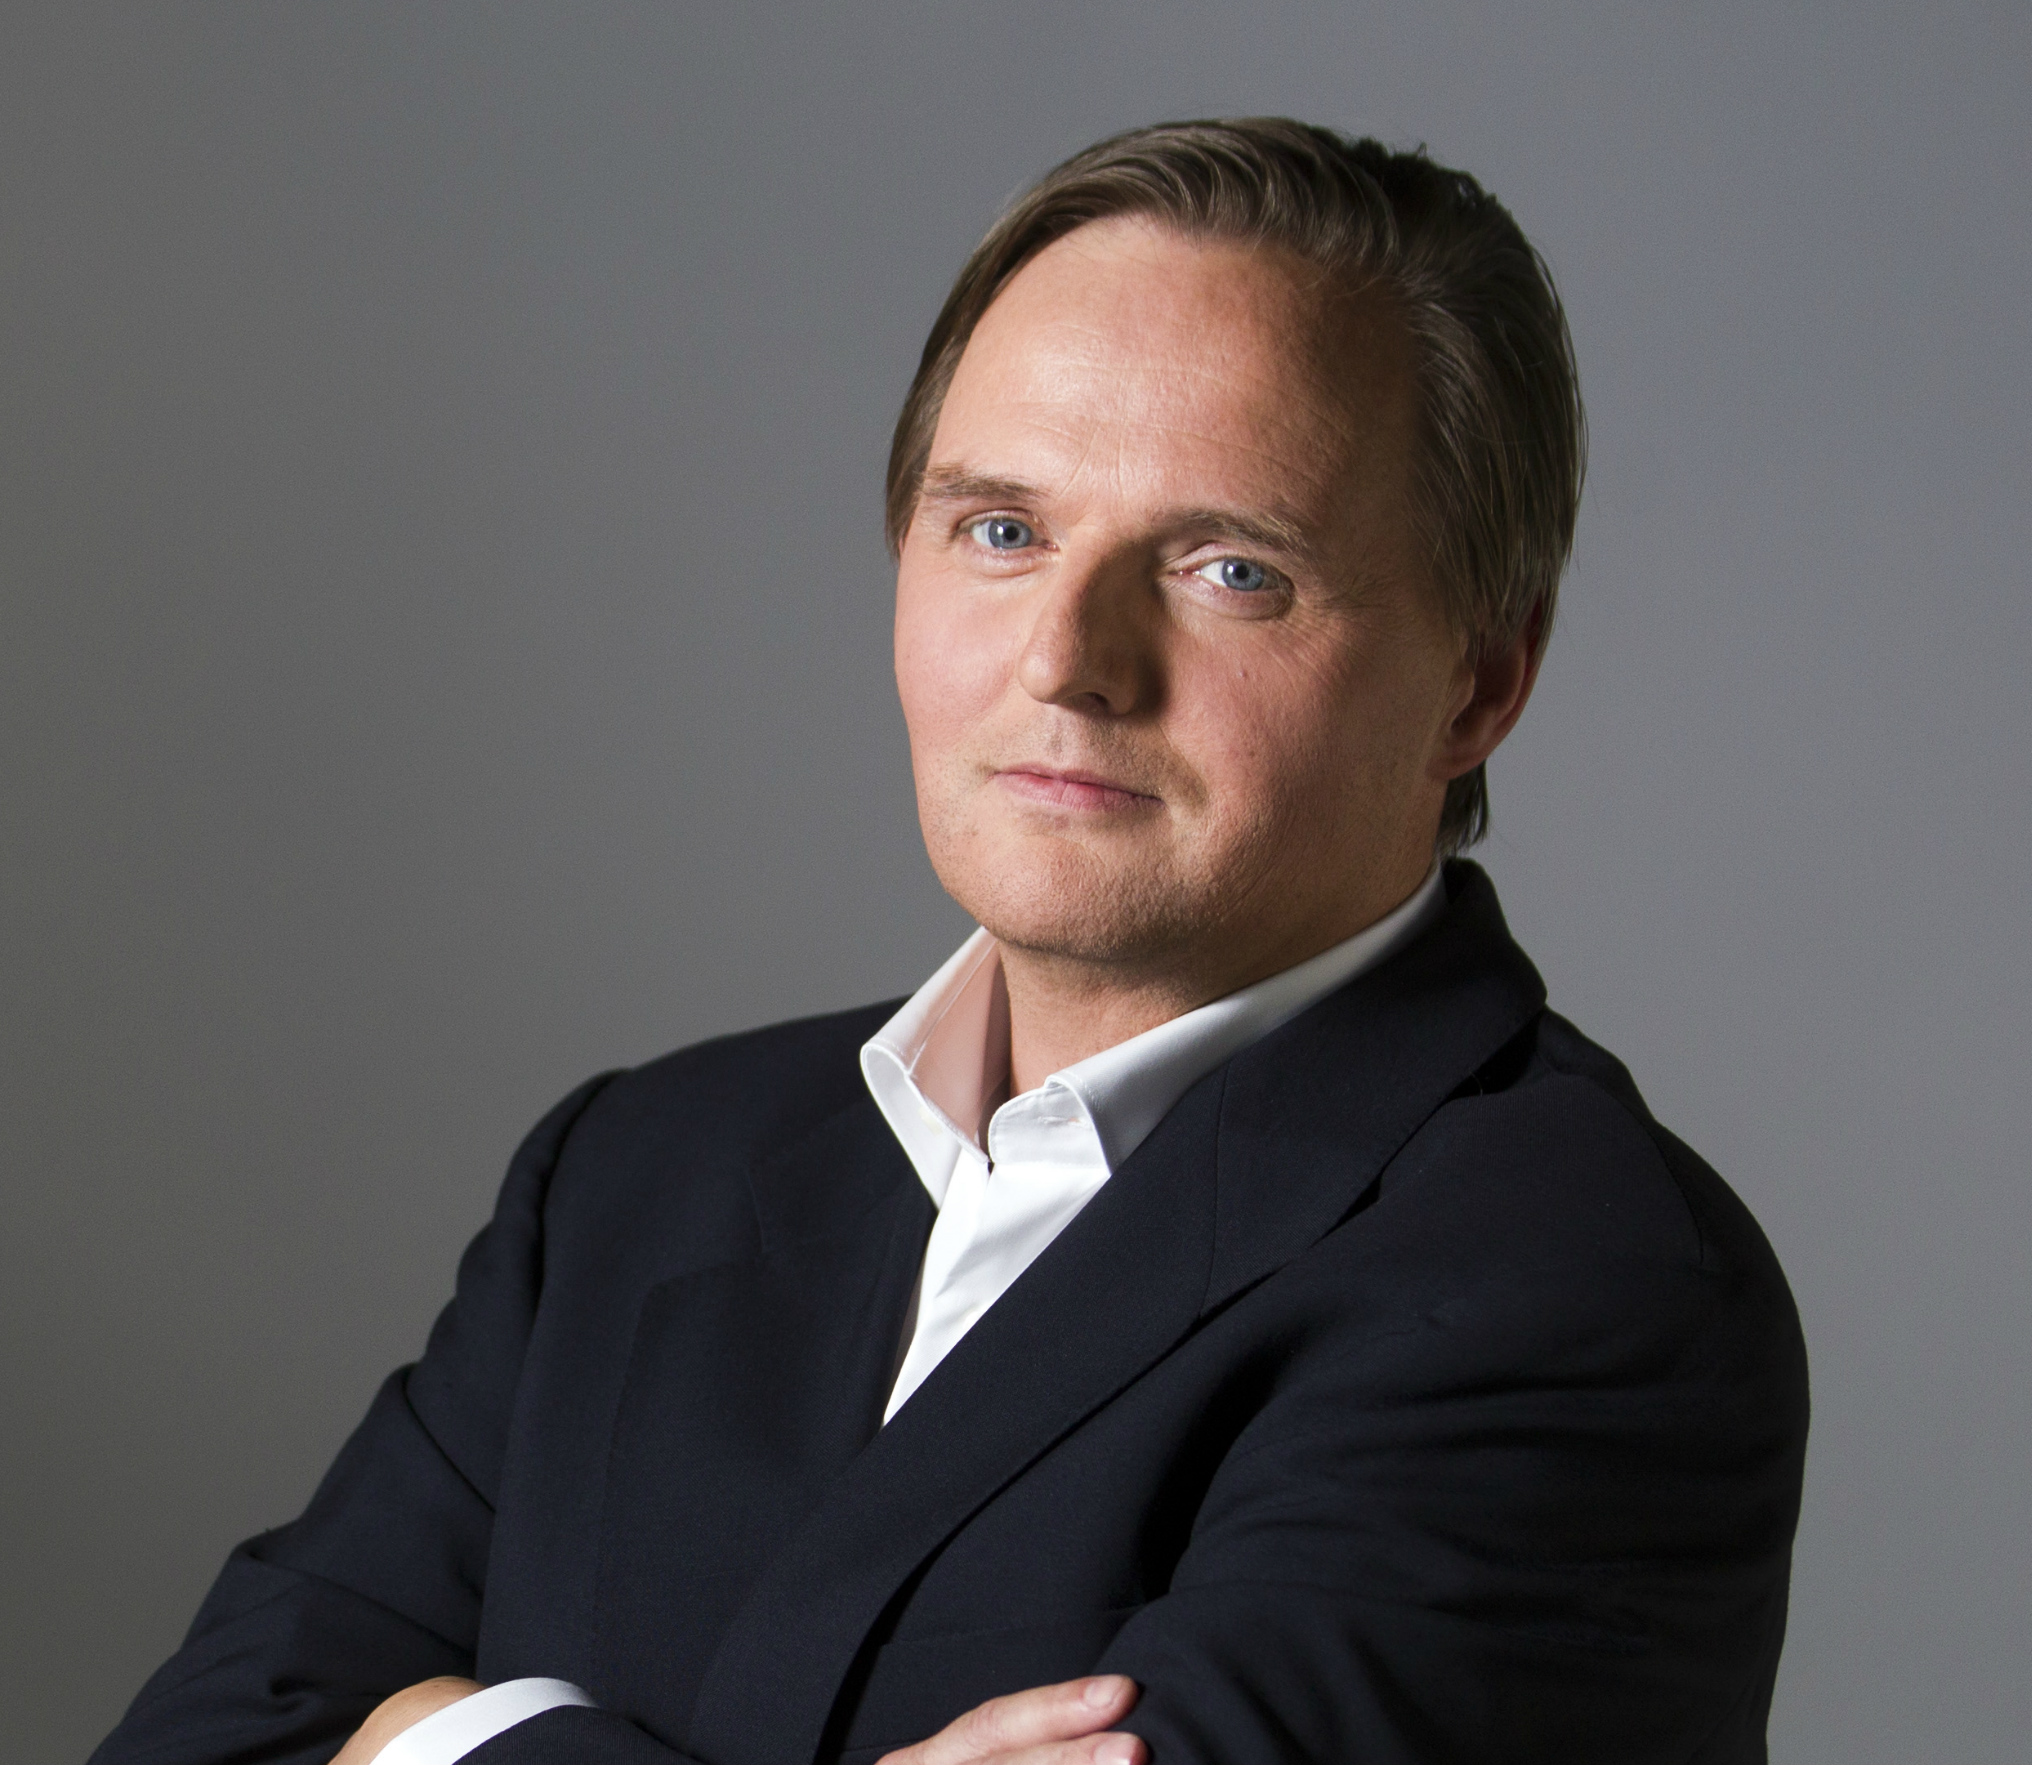 René Lukassen